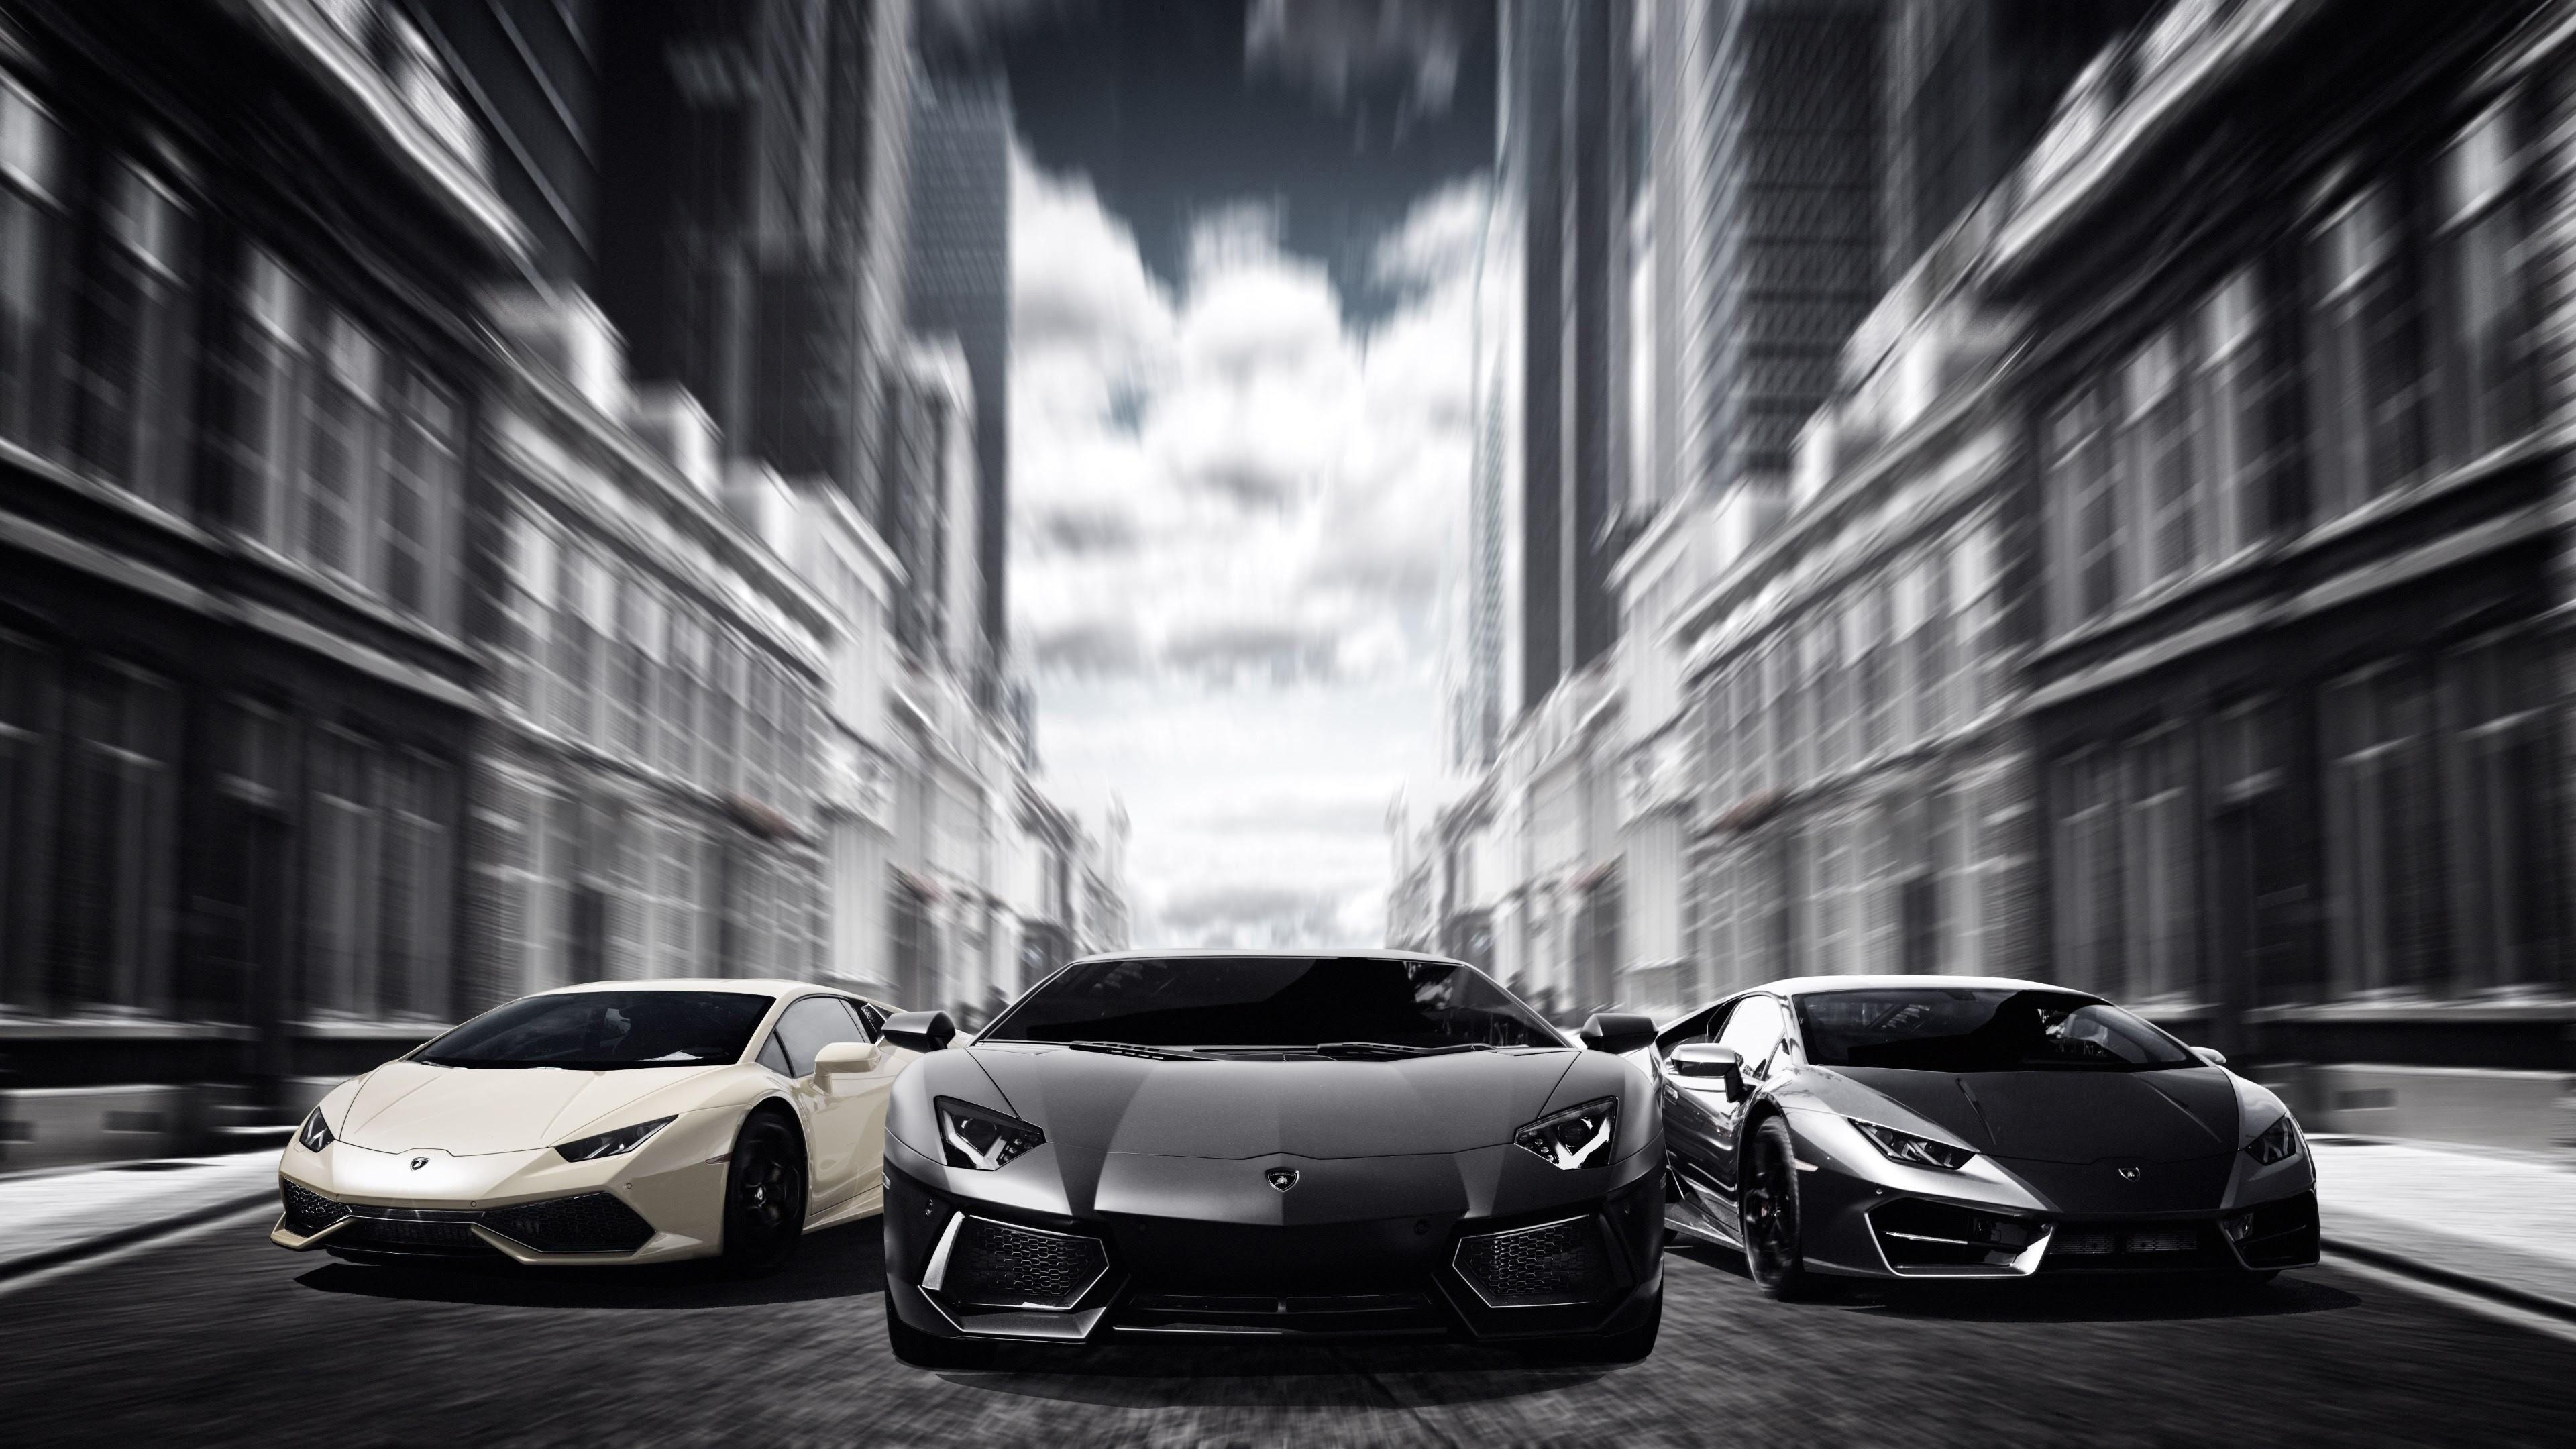 Lamborghinis Black And White 4k Lamborghini Wallpapers Hd Wallpapers Cars Wallpapers 4k Wallpapers Car Wallpapers Fancy Cars Car